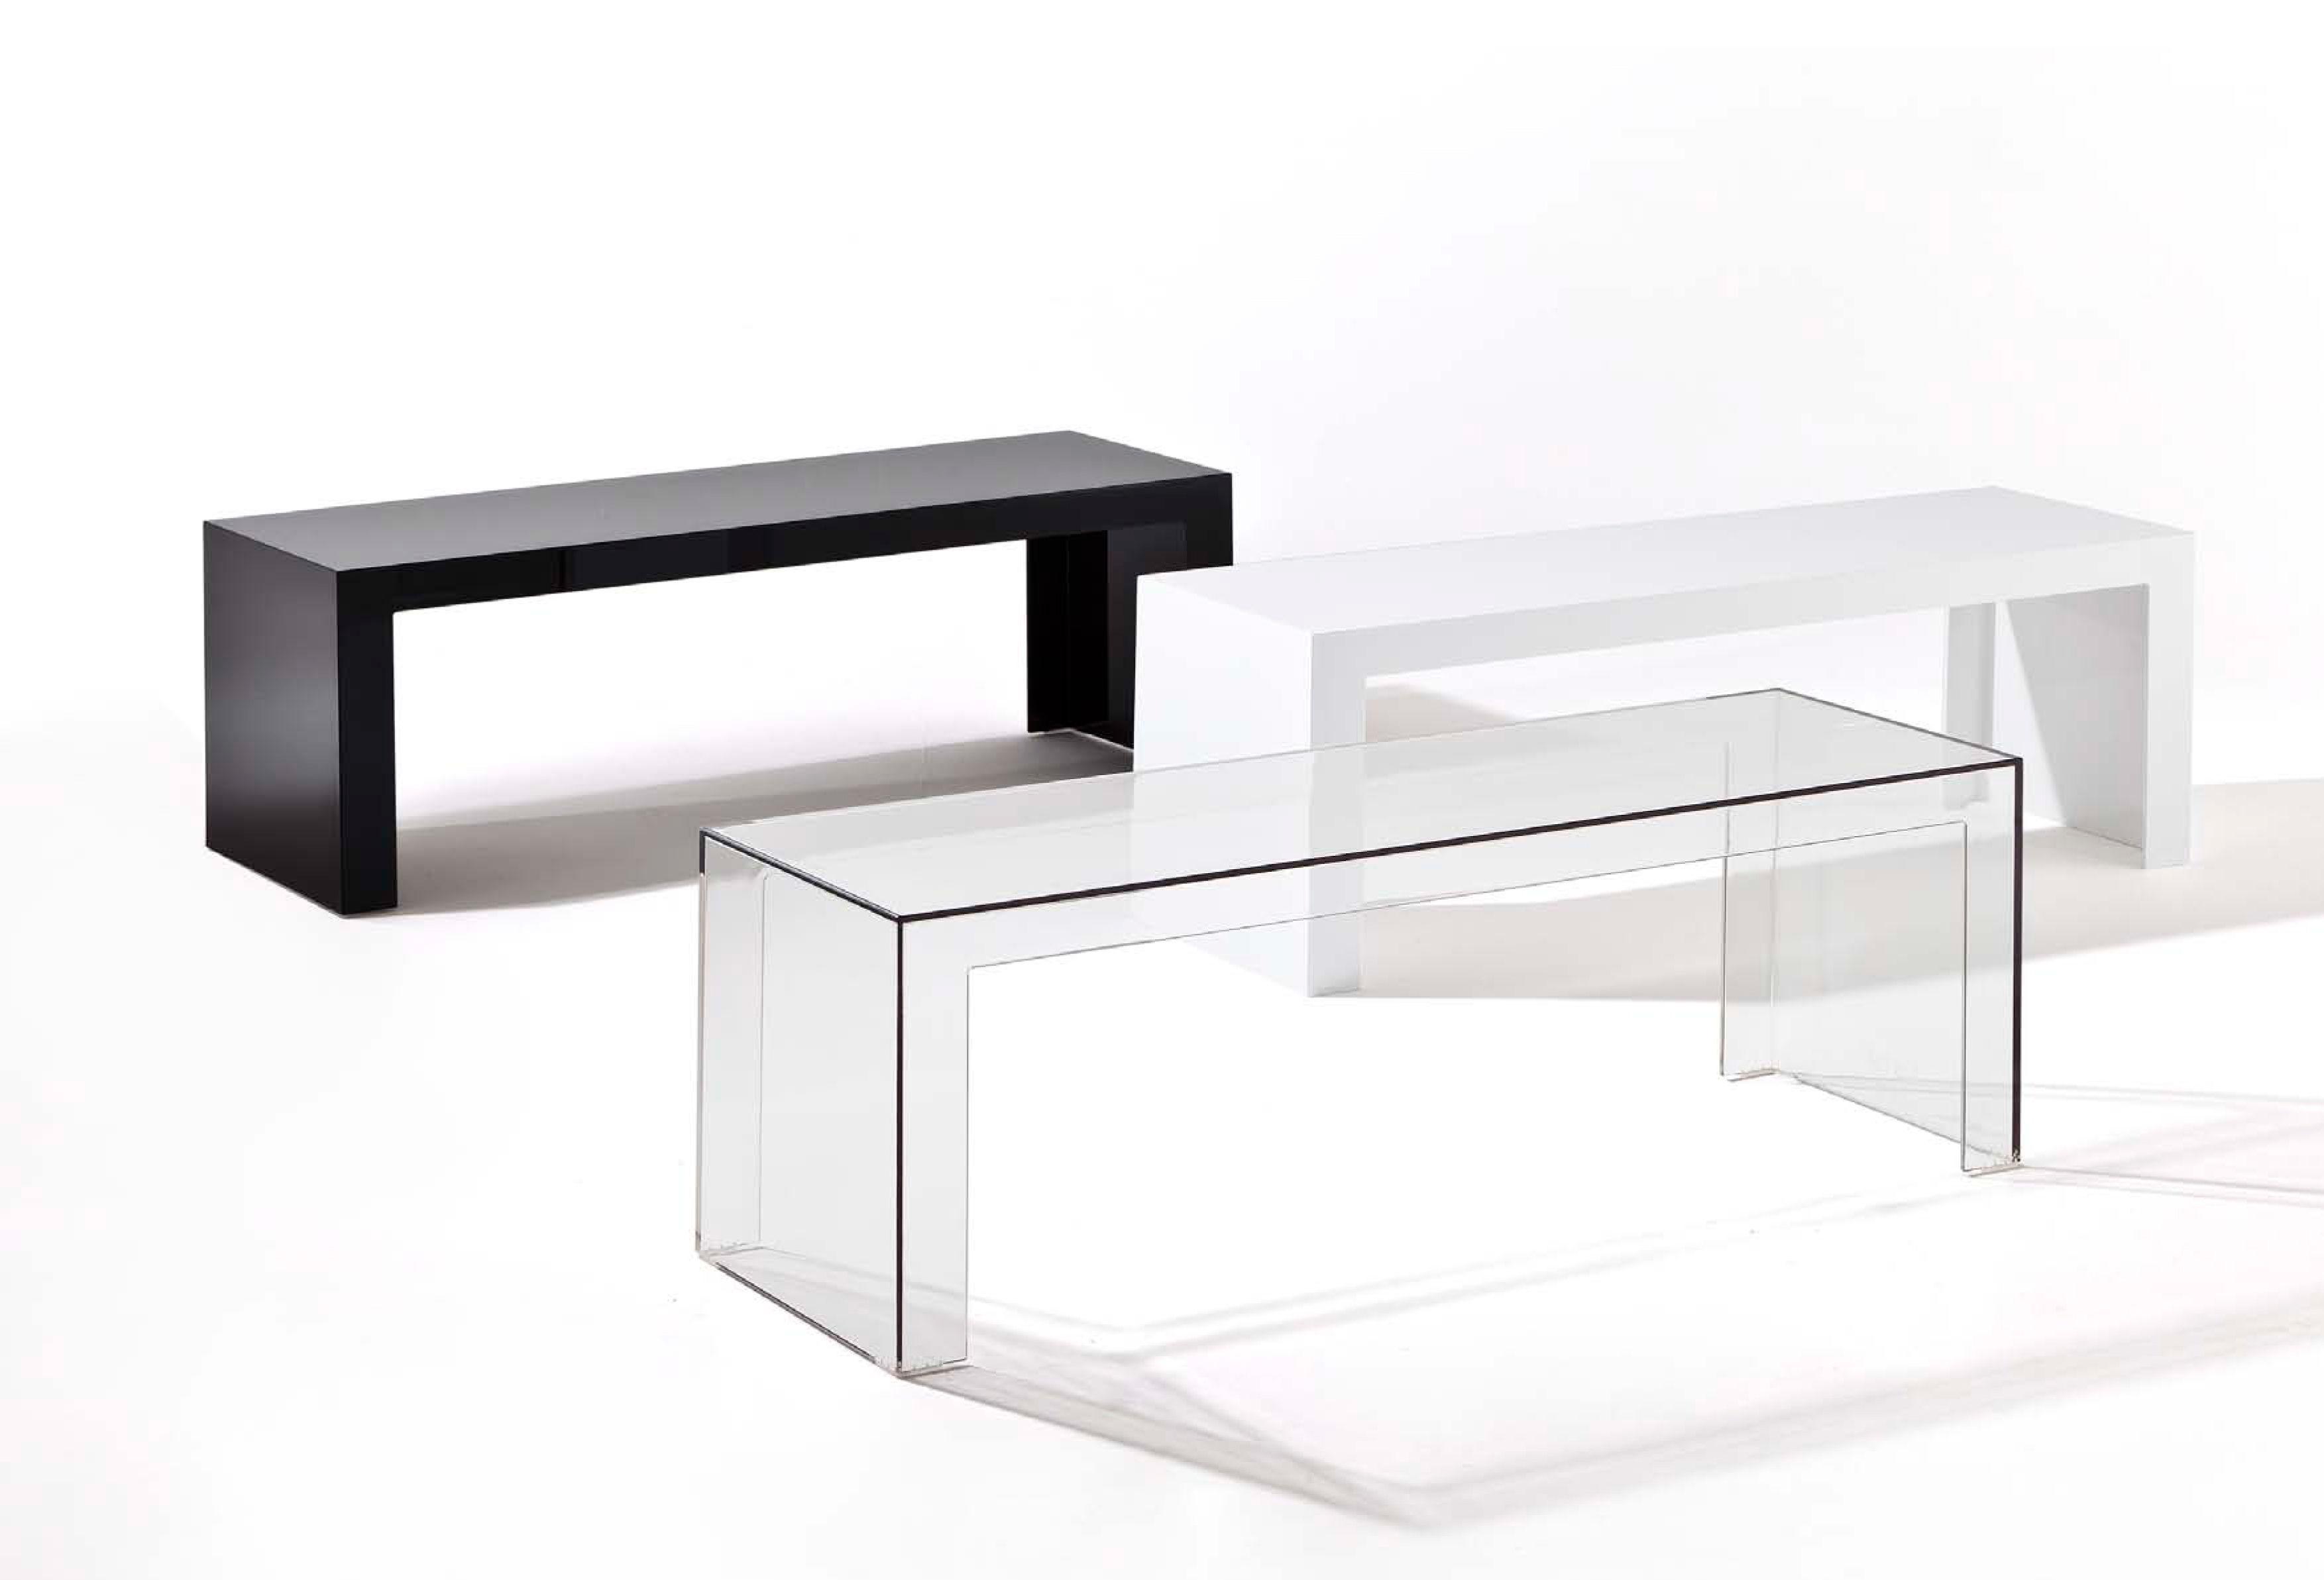 console basse invisibles side l 120 x h 40 cm cristal kartell. Black Bedroom Furniture Sets. Home Design Ideas